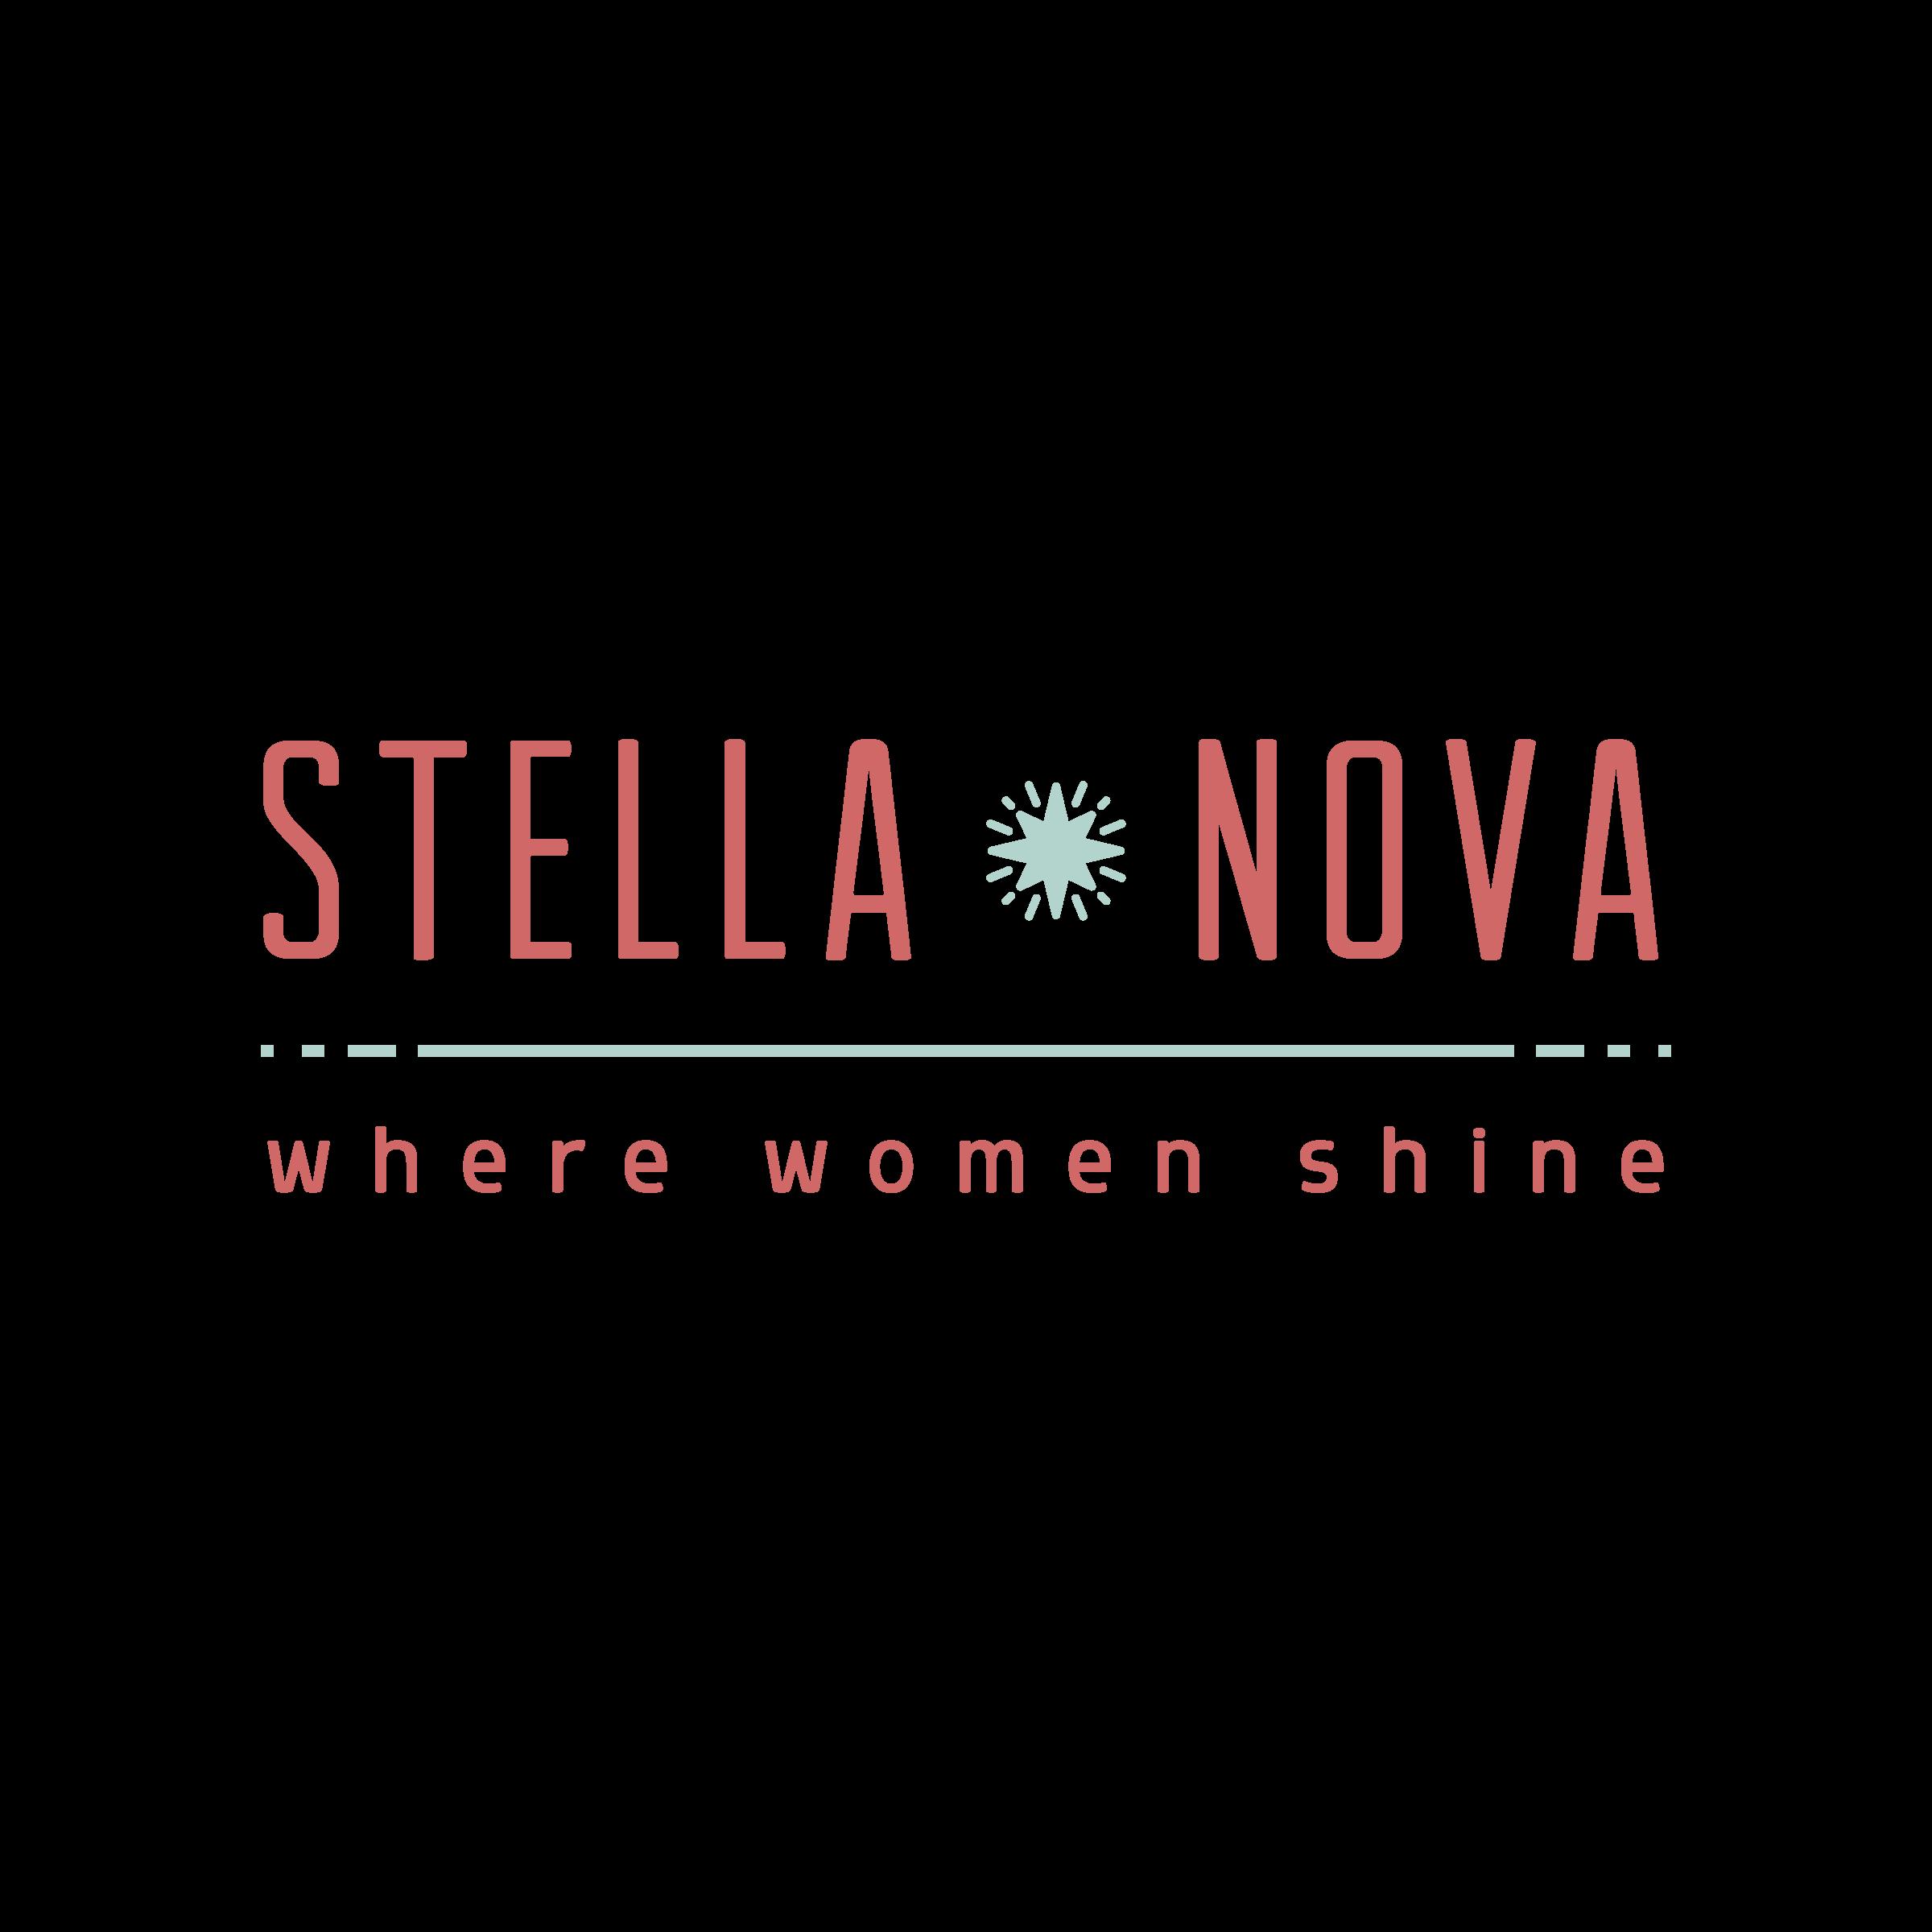 Stella-Nova-01.png